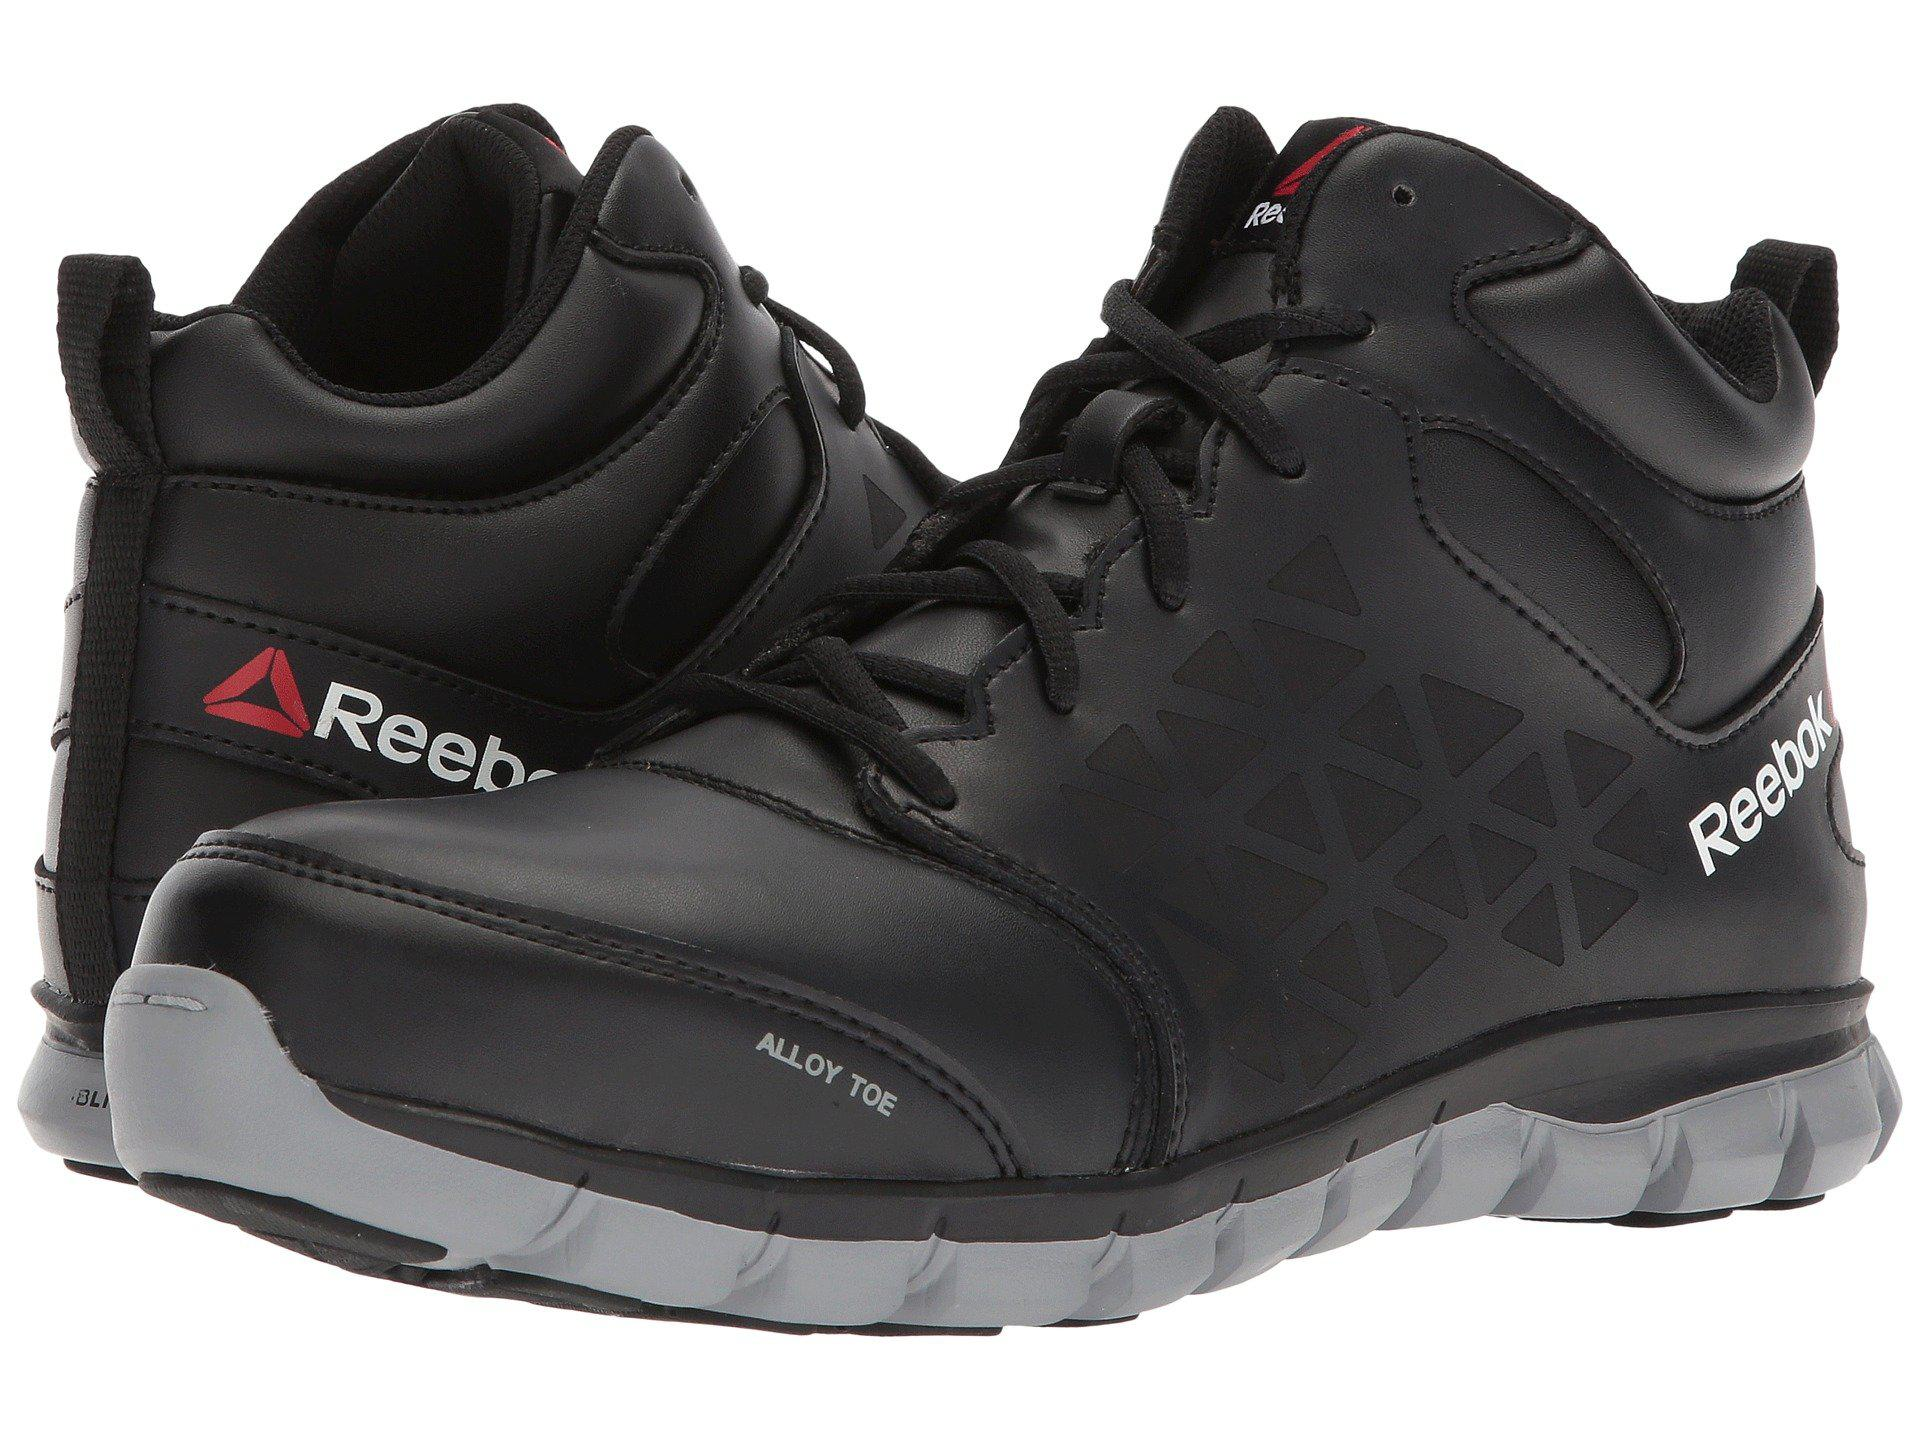 Cushion Mid Lyst Eh Boots Reebok Work black Sublite Men s rxw7EFqw d7bdb3d8a